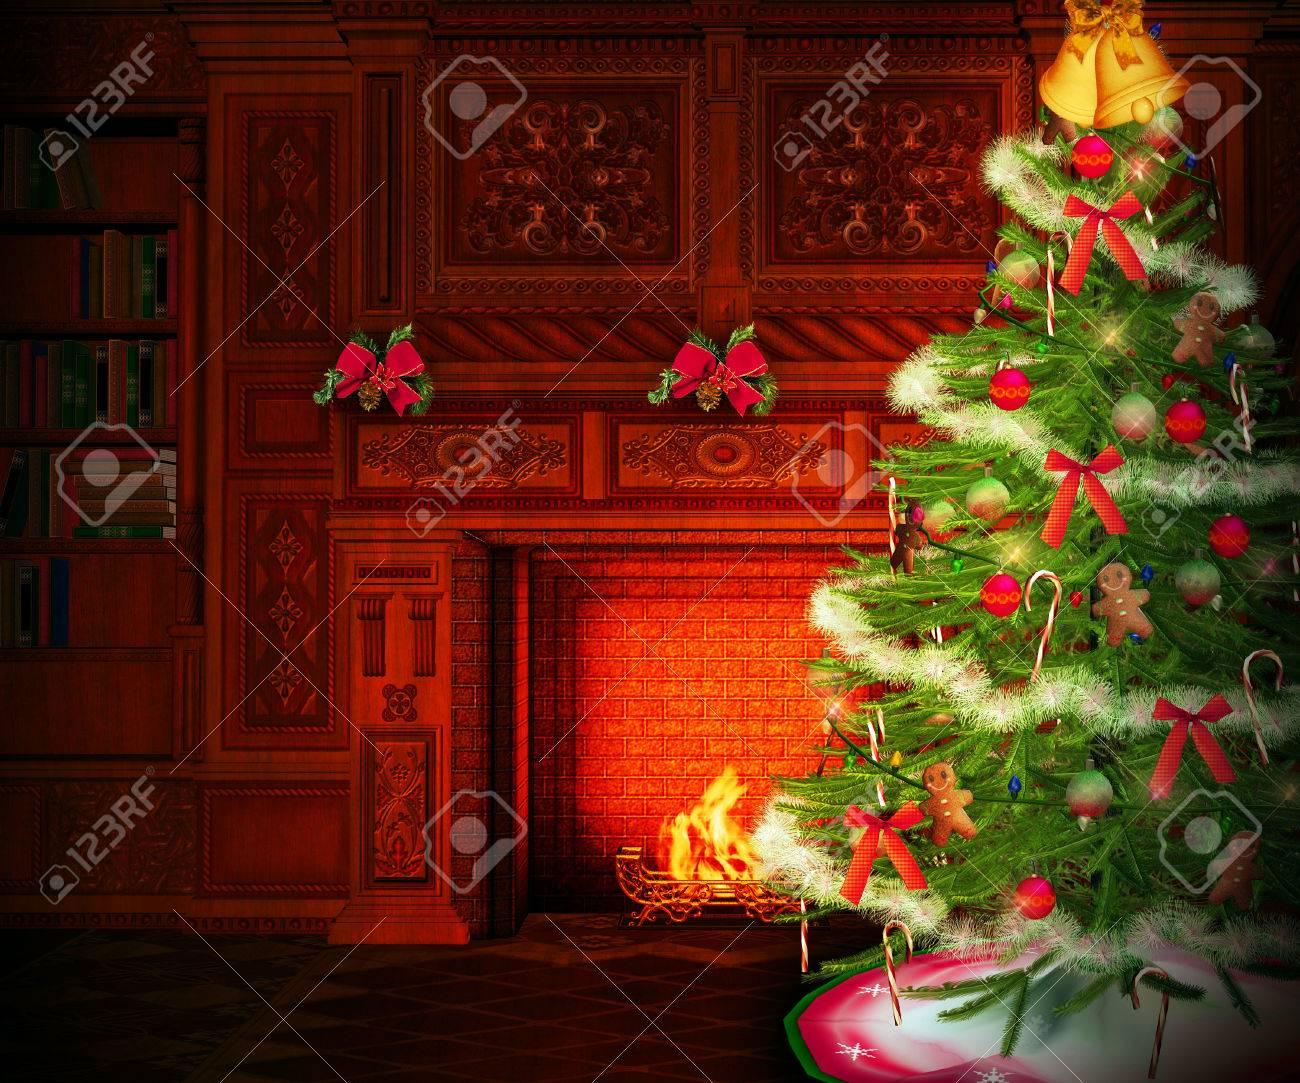 Christmas Fireplace Interior Backdrop